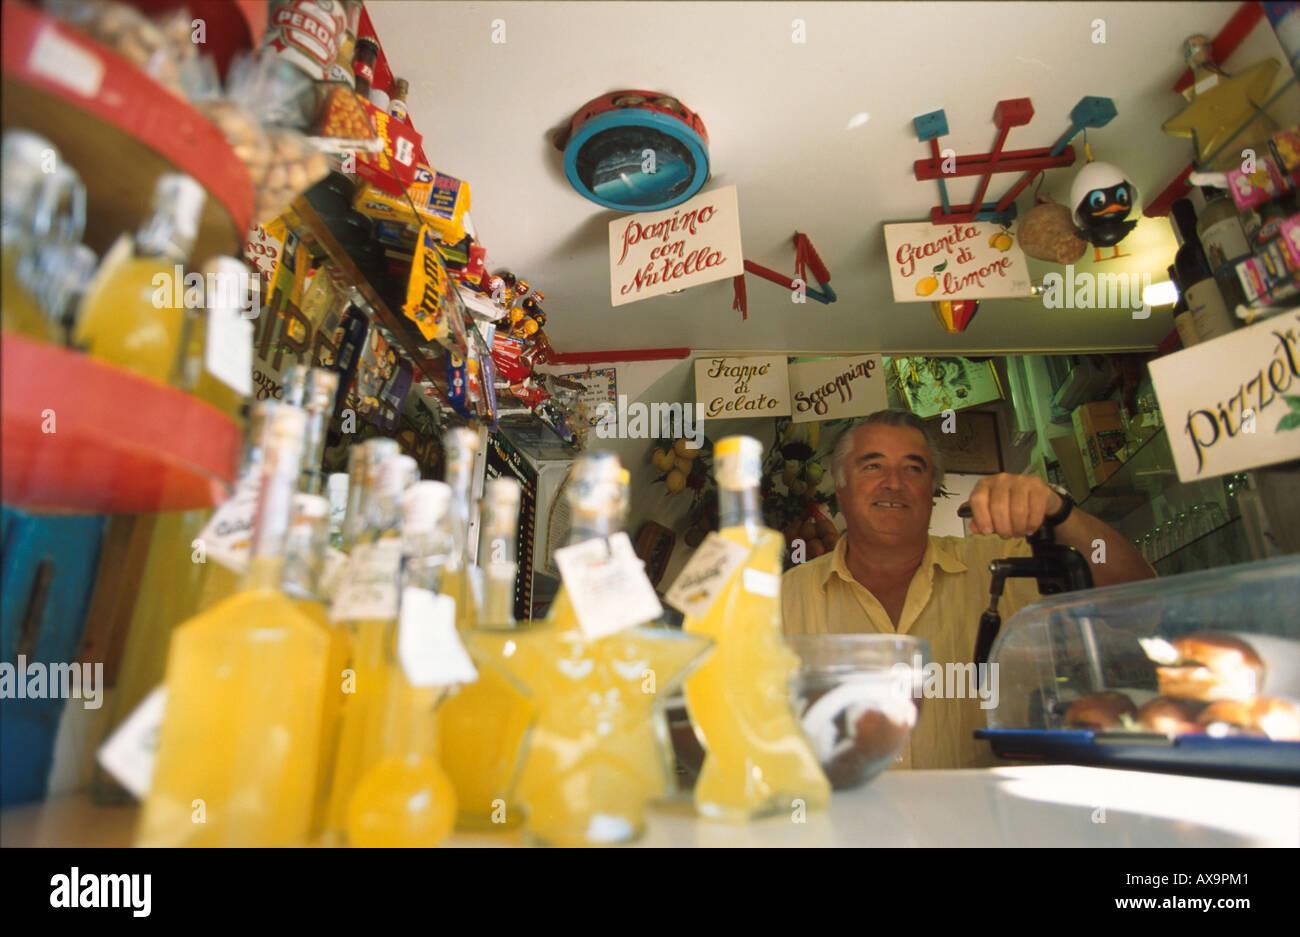 Eis und Getraenkestand, Capri, Kampanien Italien - Stock Image